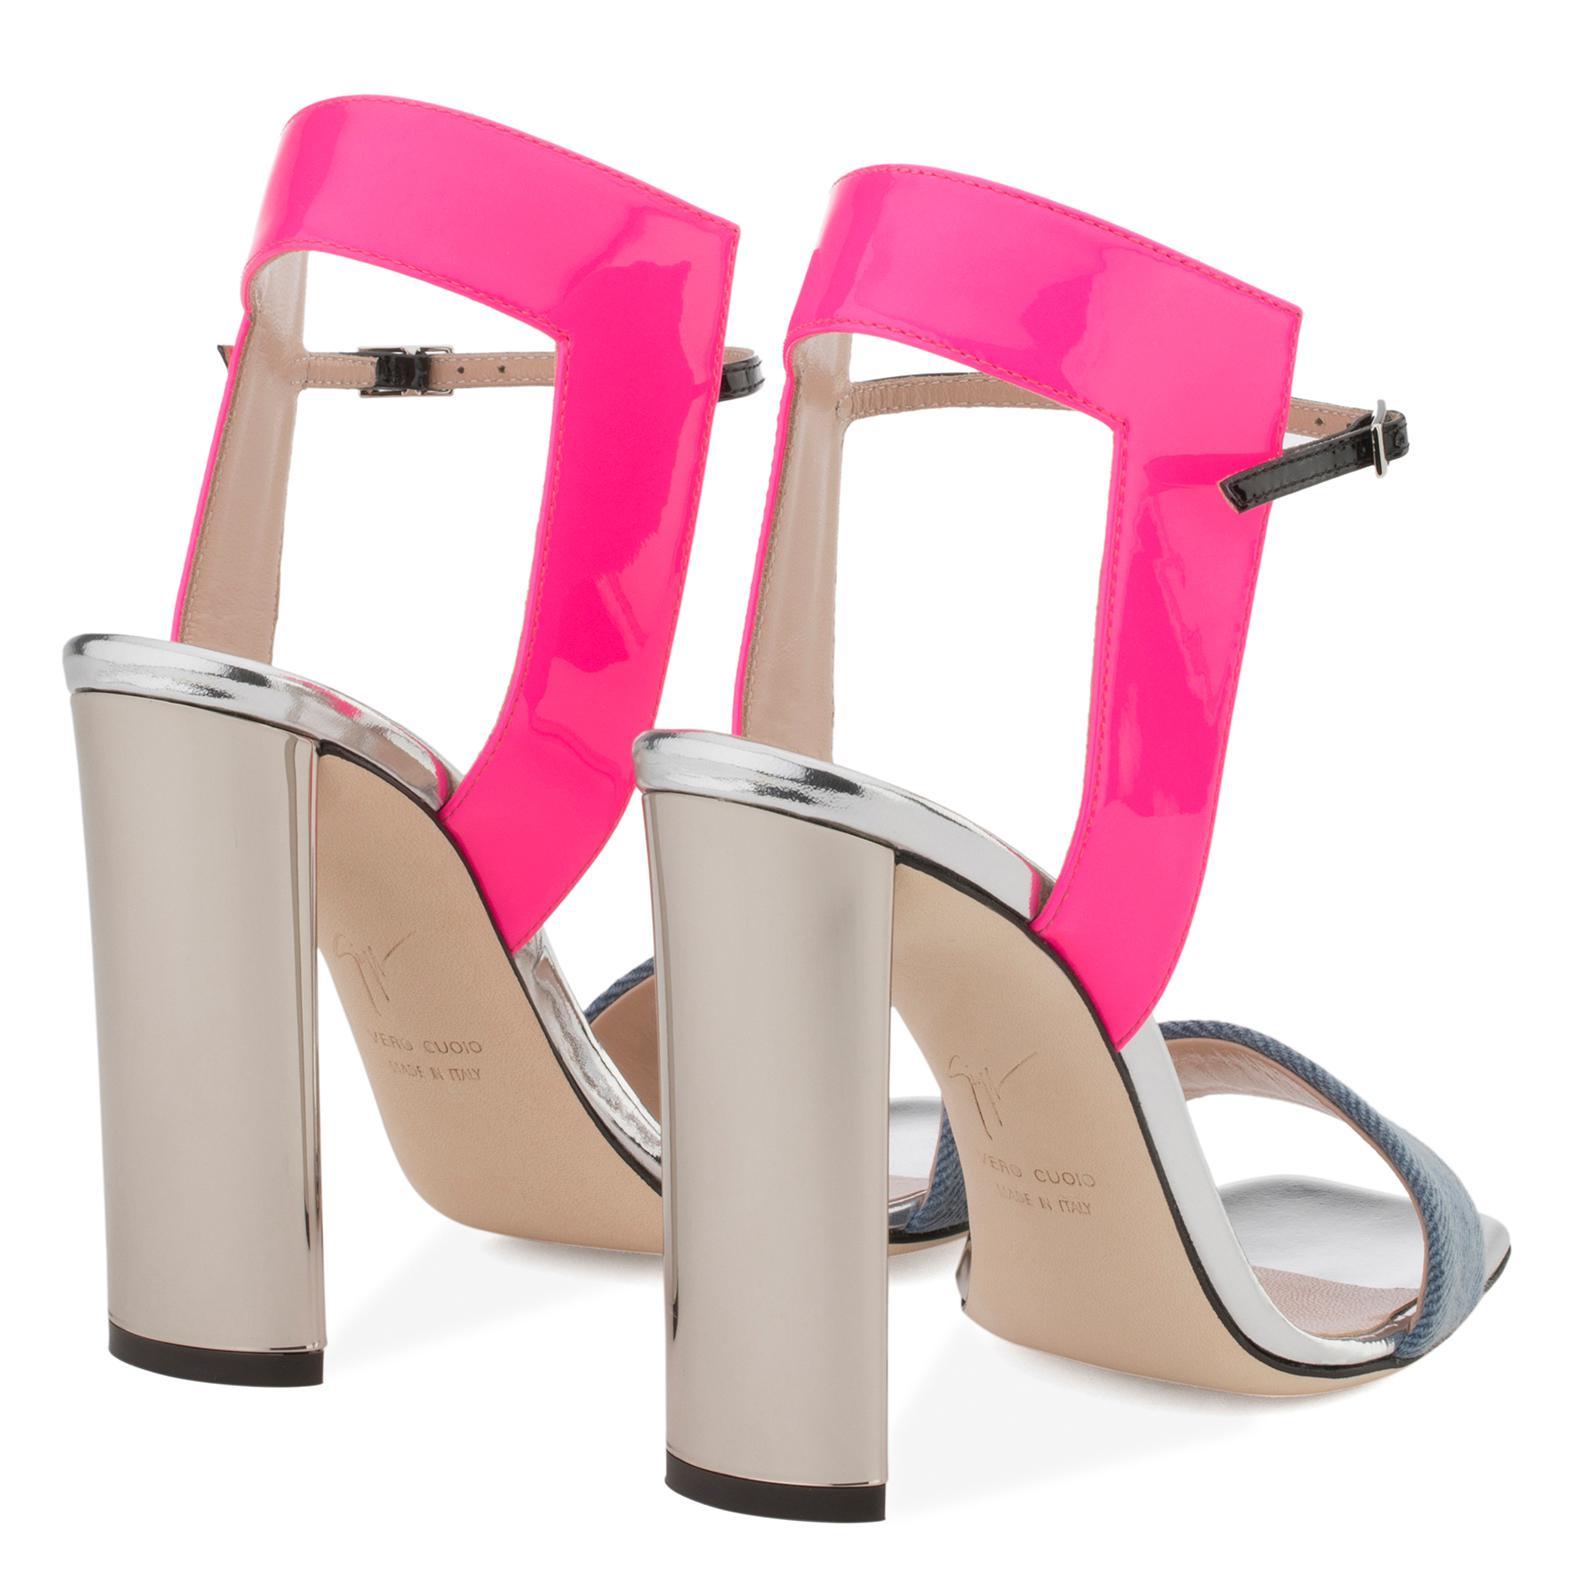 Giuseppe Zanotti Blue denim and fuxia leather sandal BRIELLE WtQwWjC1l